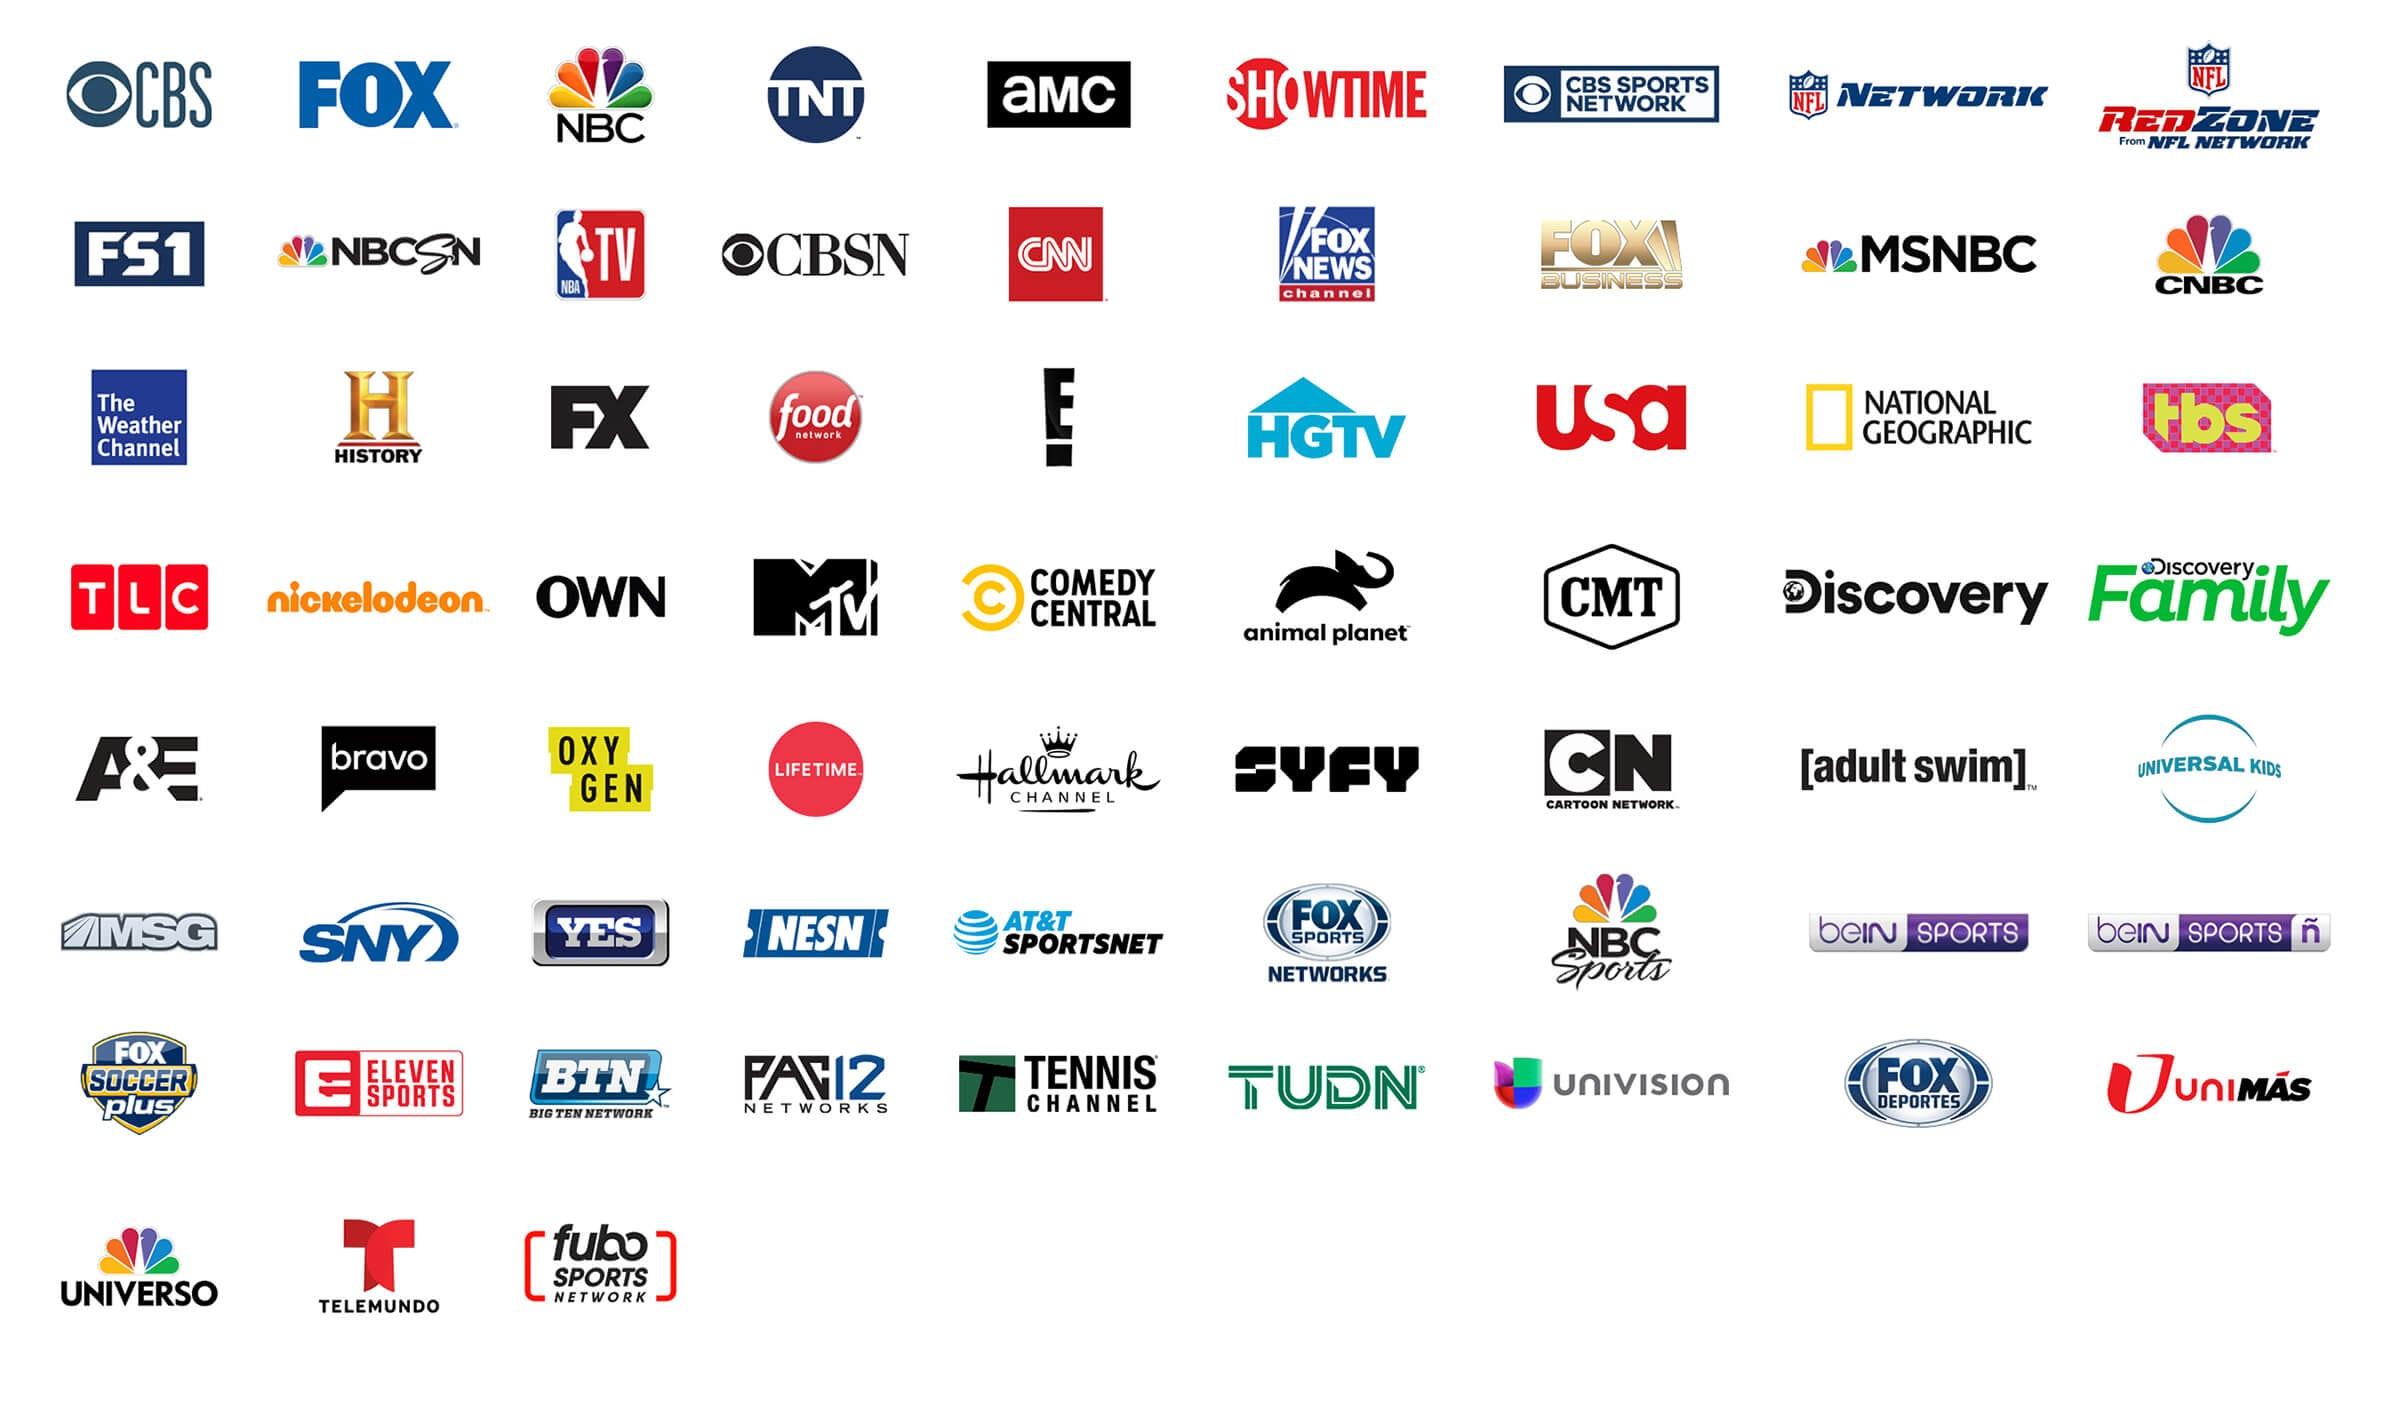 FuboTV channels